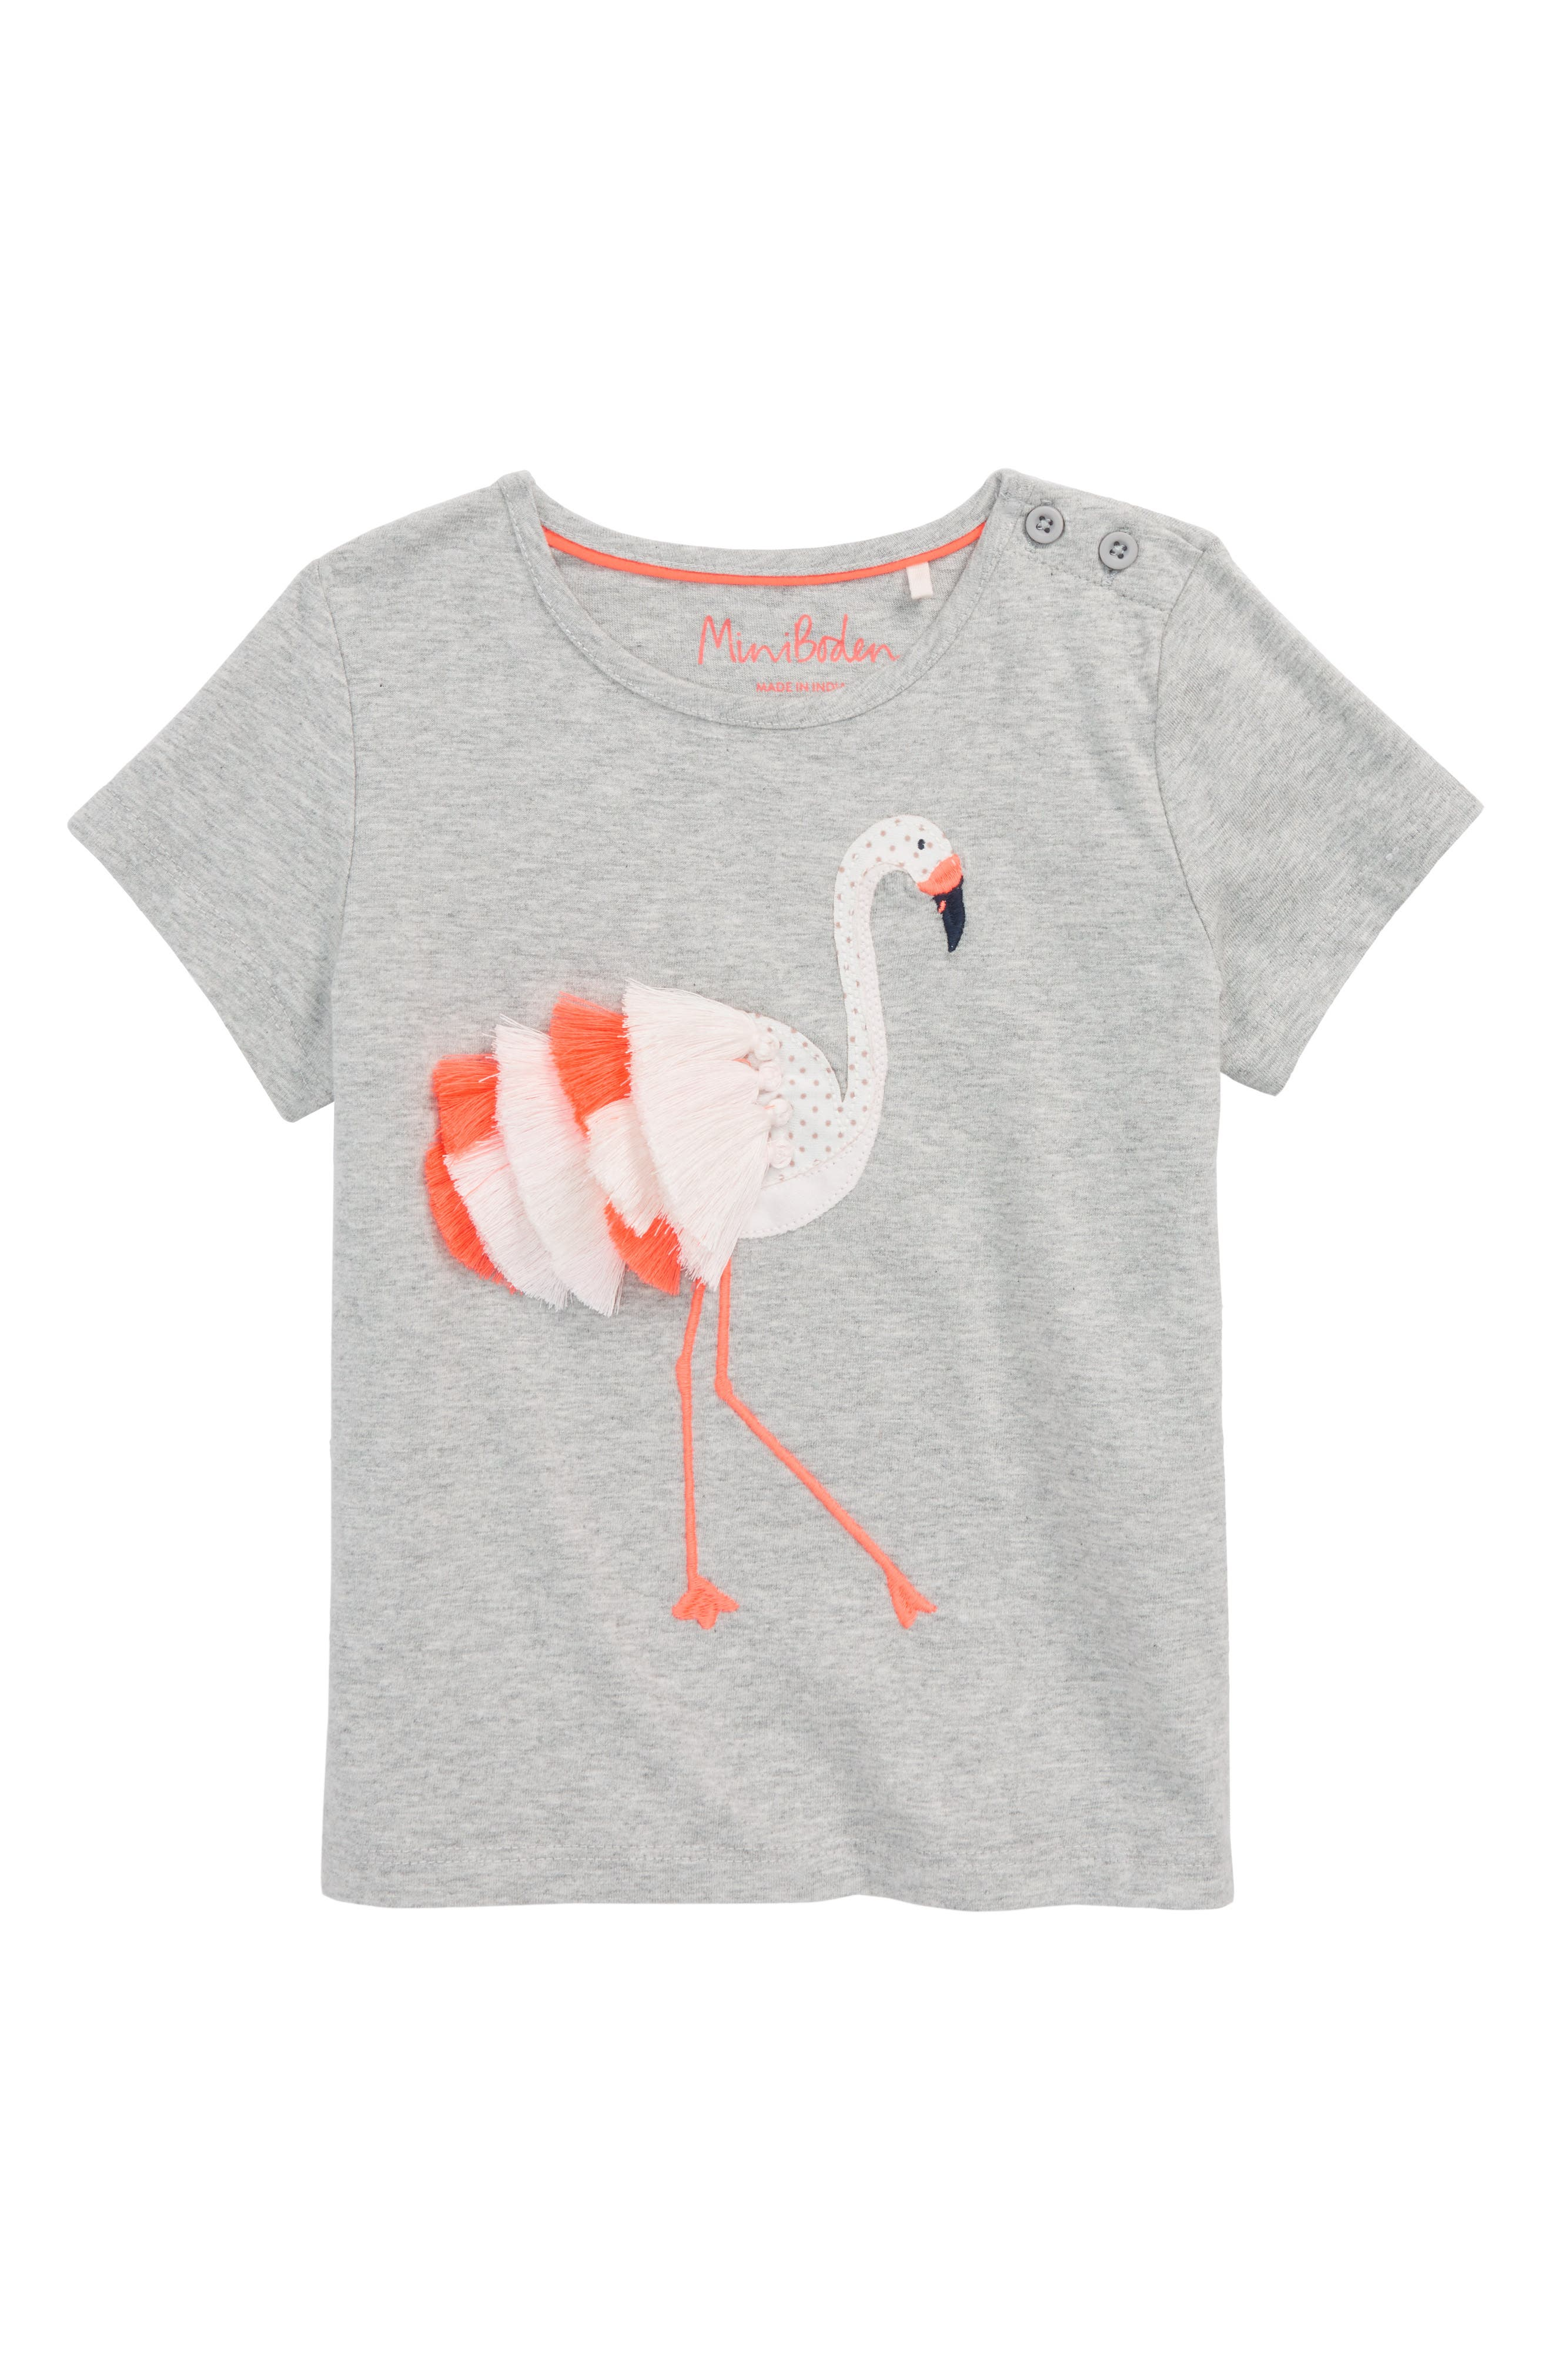 Tropical Animal Tee,                             Main thumbnail 1, color,                             Grey Marl Flamingo